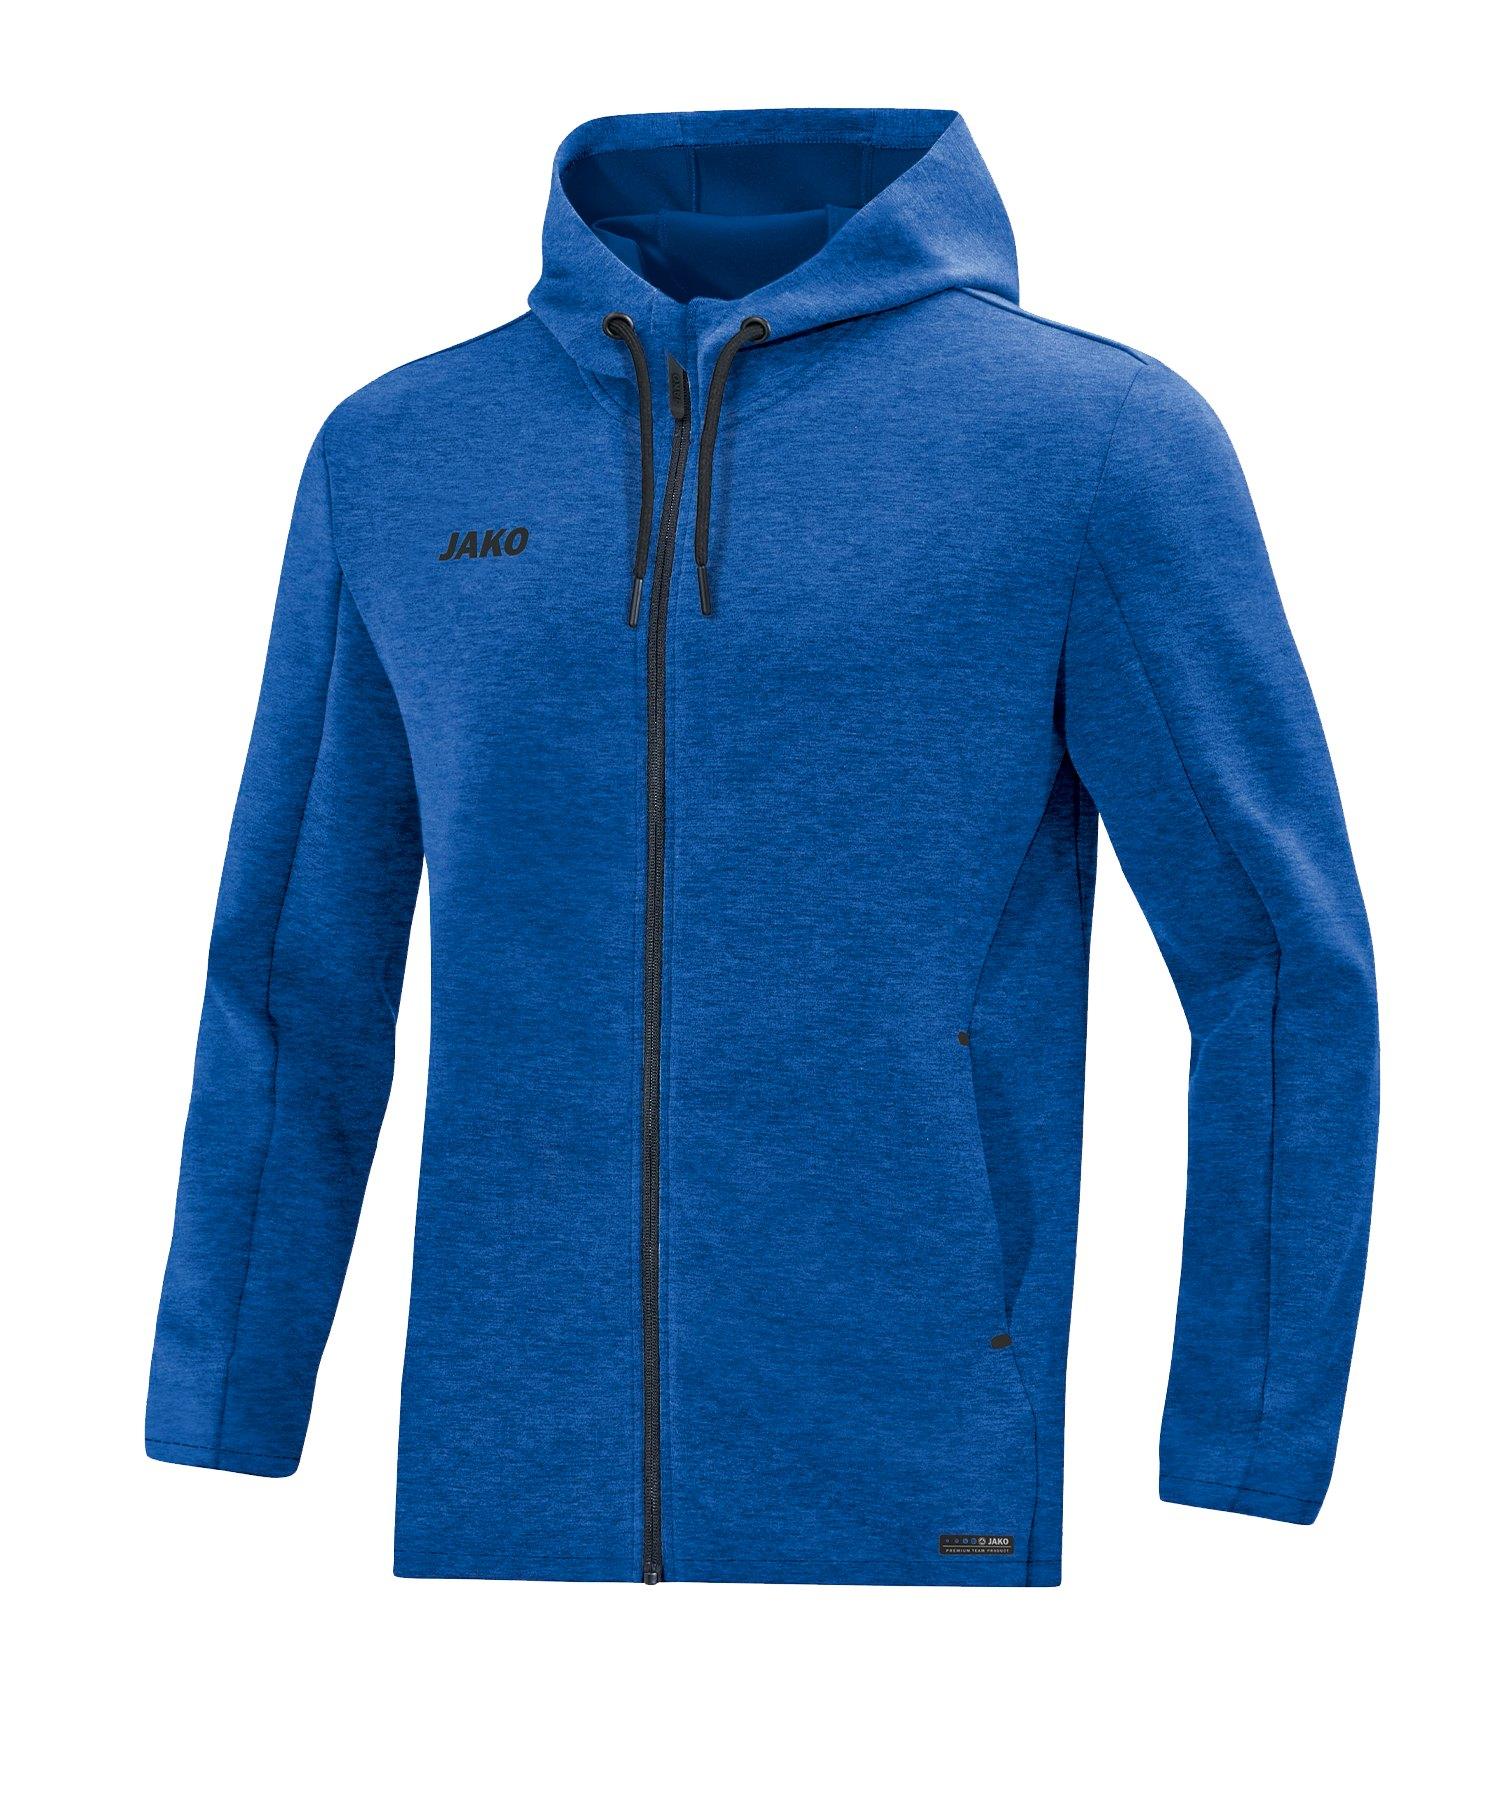 Jako Premium Basic Kapuzenjacke Blau F04 - blau